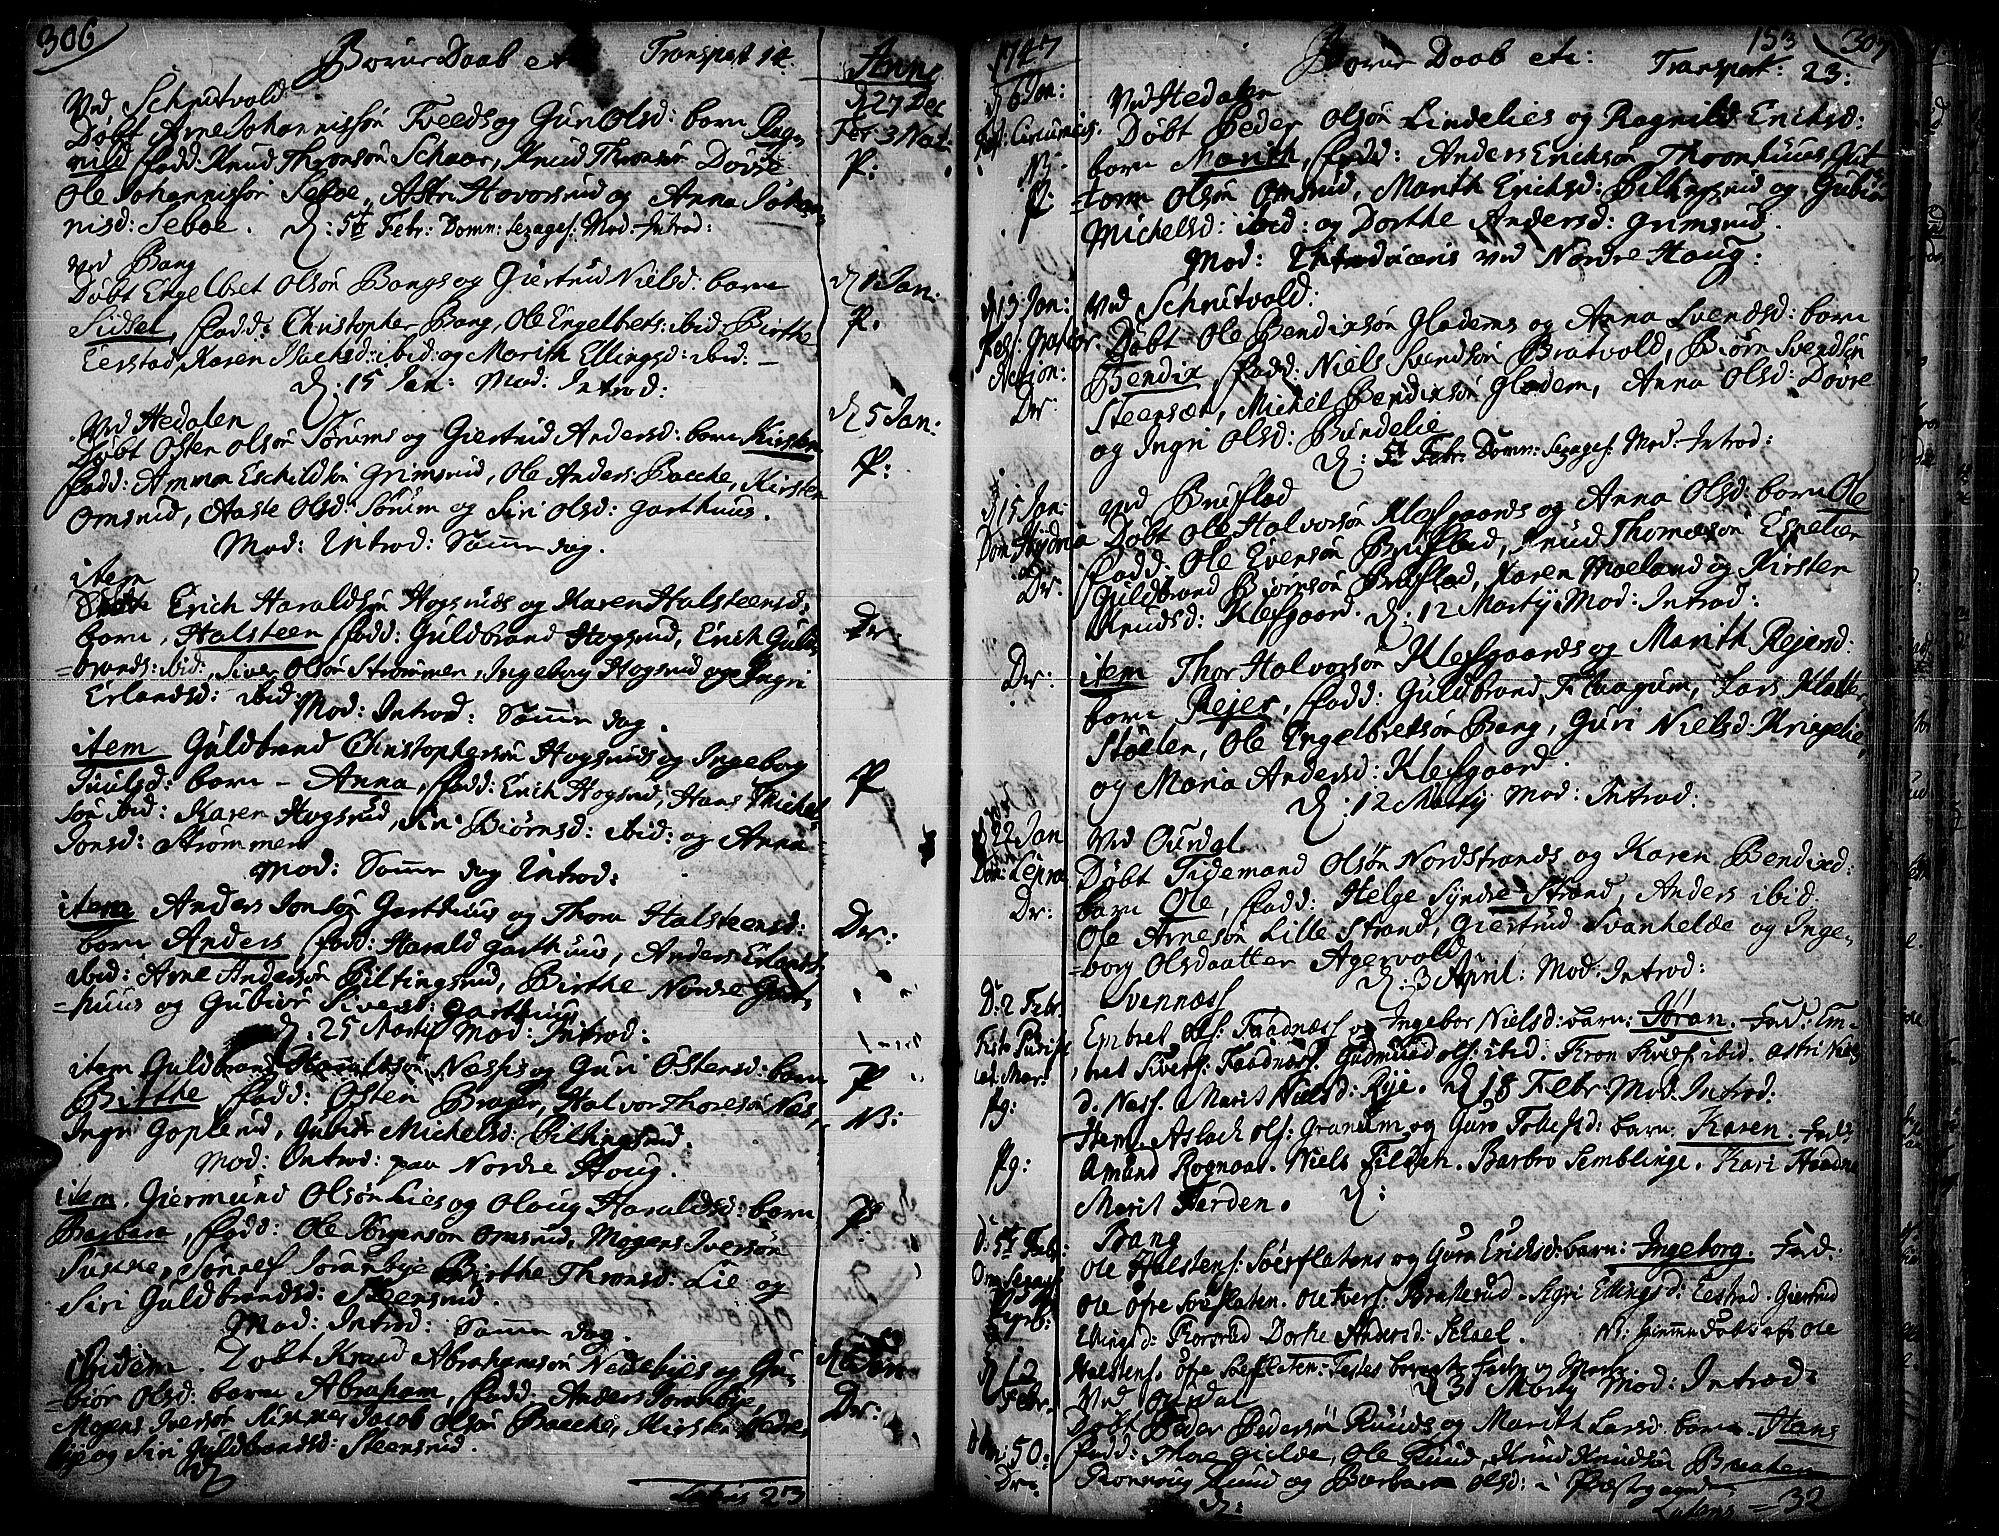 SAH, Aurdal prestekontor, Ministerialbok nr. 4, 1730-1762, s. 306-307